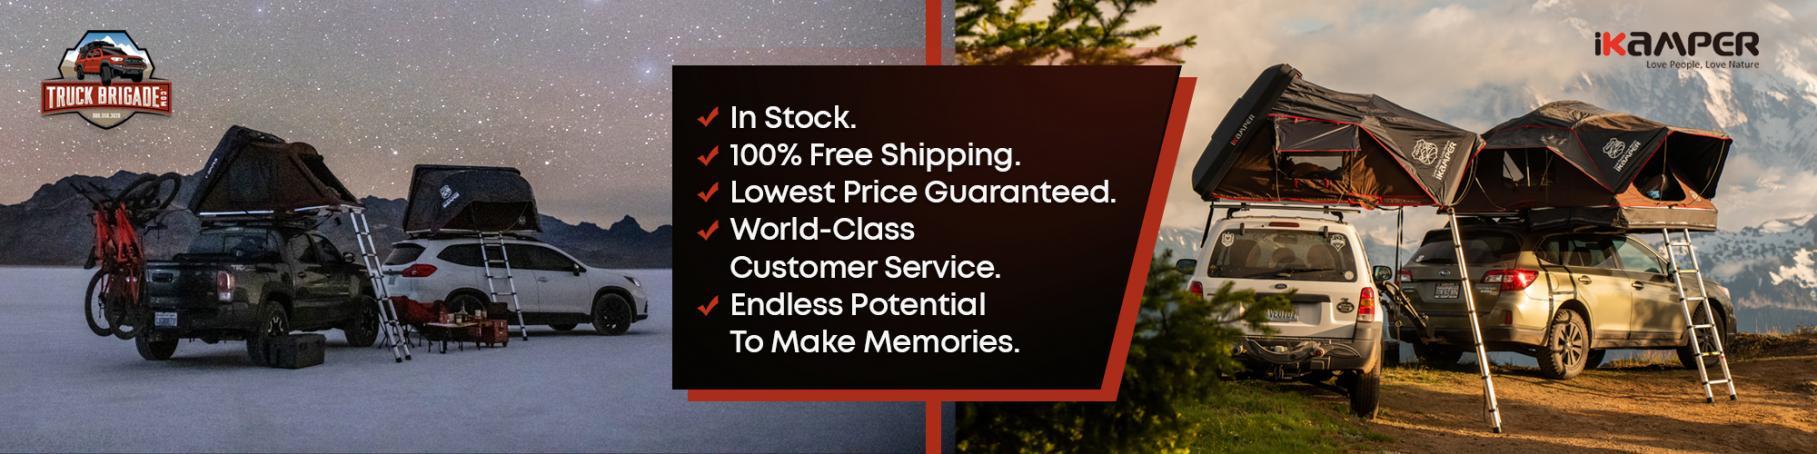 iKamper Roof Top Tents: In Stock, Free Shipping, Best Price-prerunnerryan-2000-500-354343-jpg